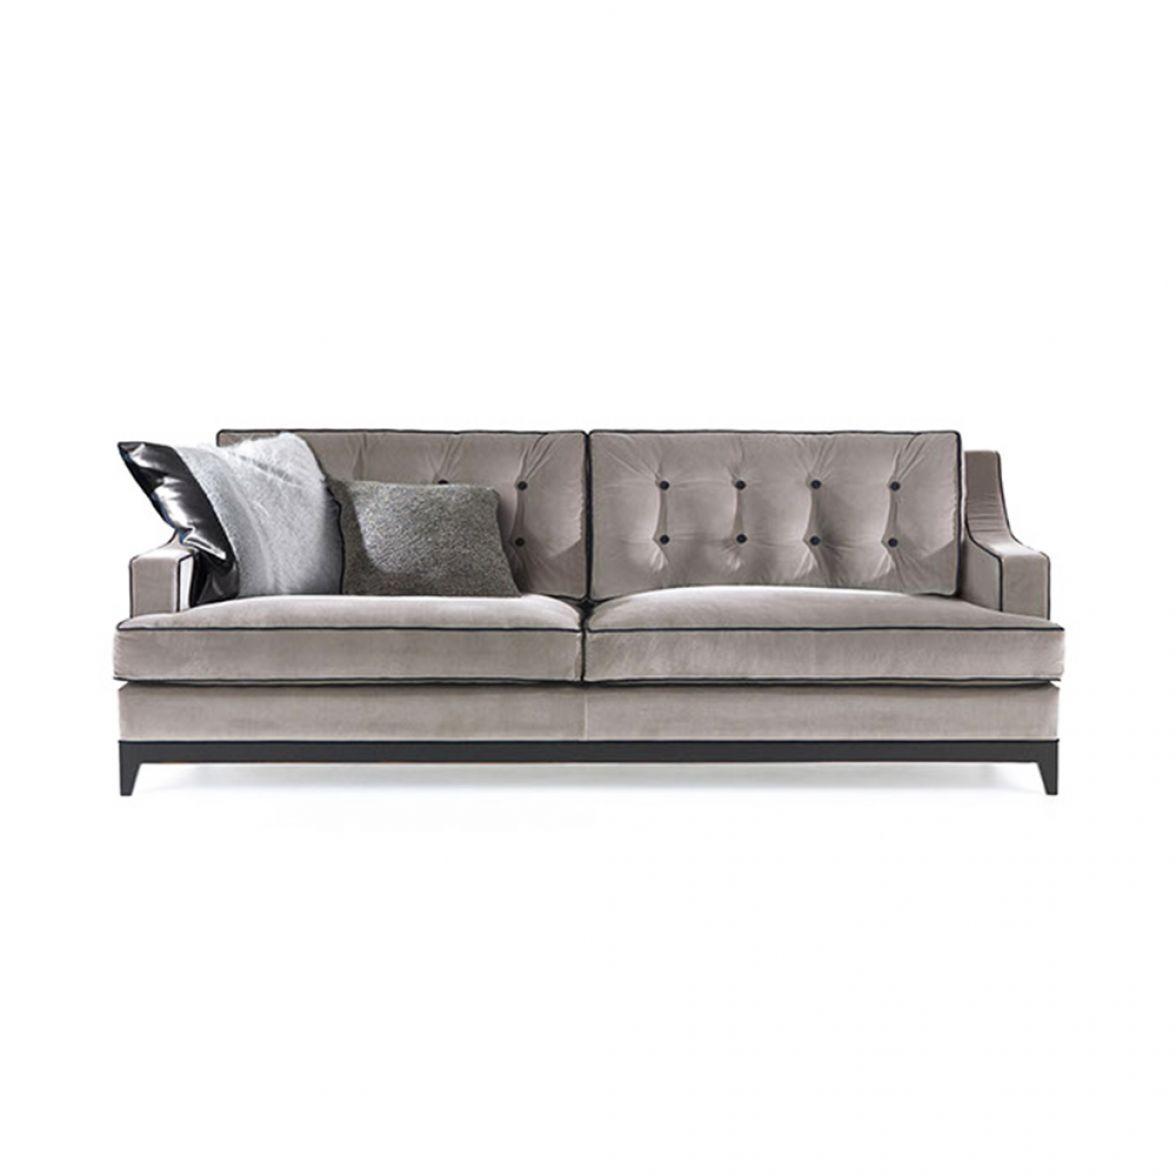 Clark sofa фото цена